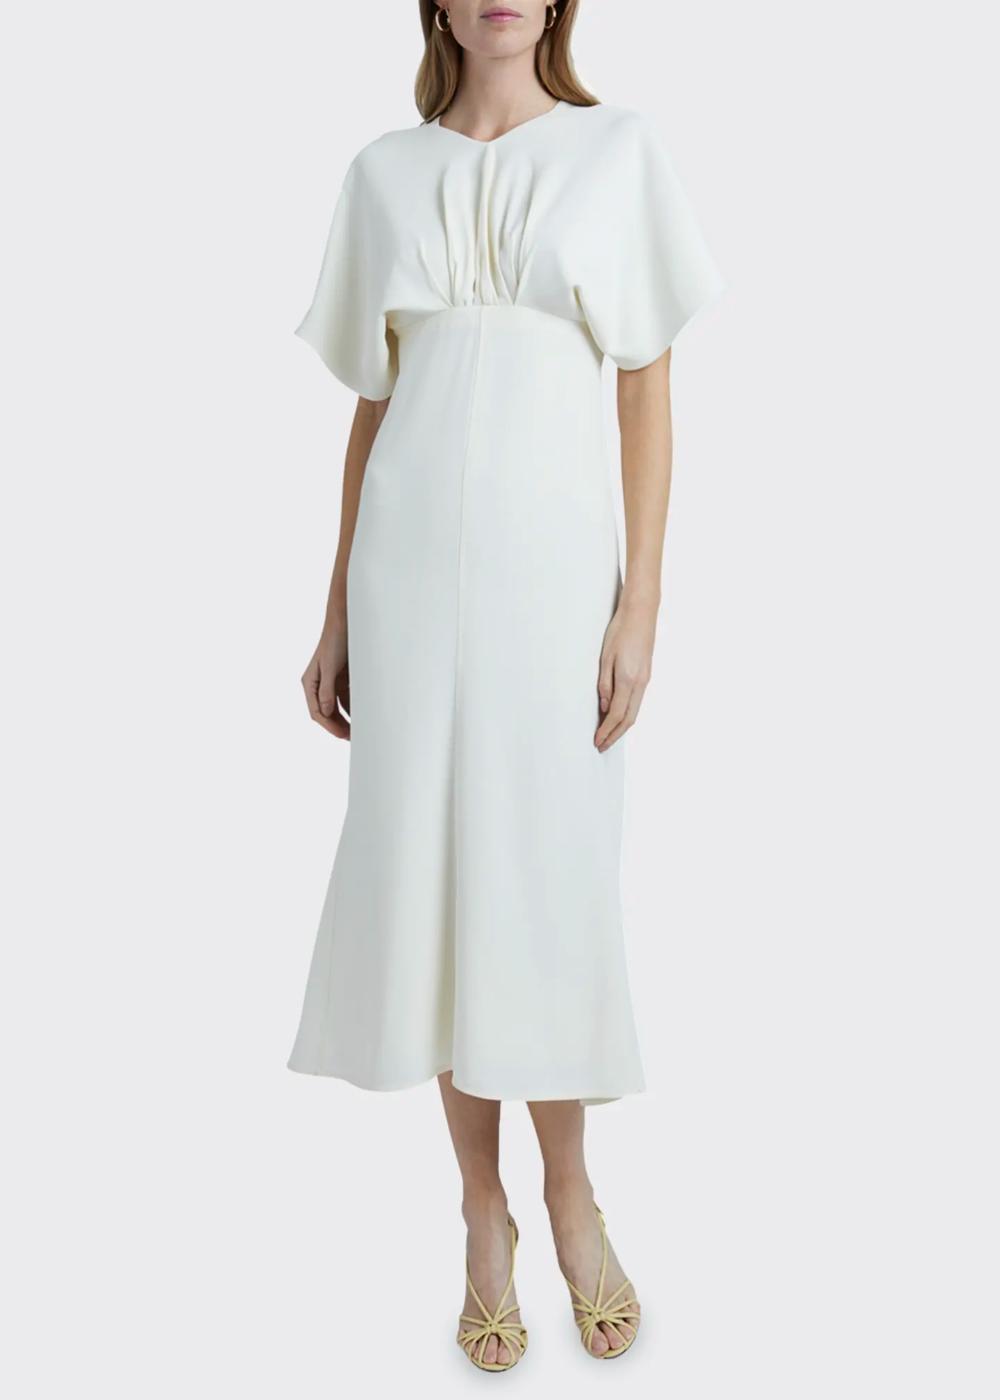 Victoria Beckham Batwing Midi Dress Bergdorf Goodman Fashion Fashion Outfits Dresses [ 1400 x 1000 Pixel ]